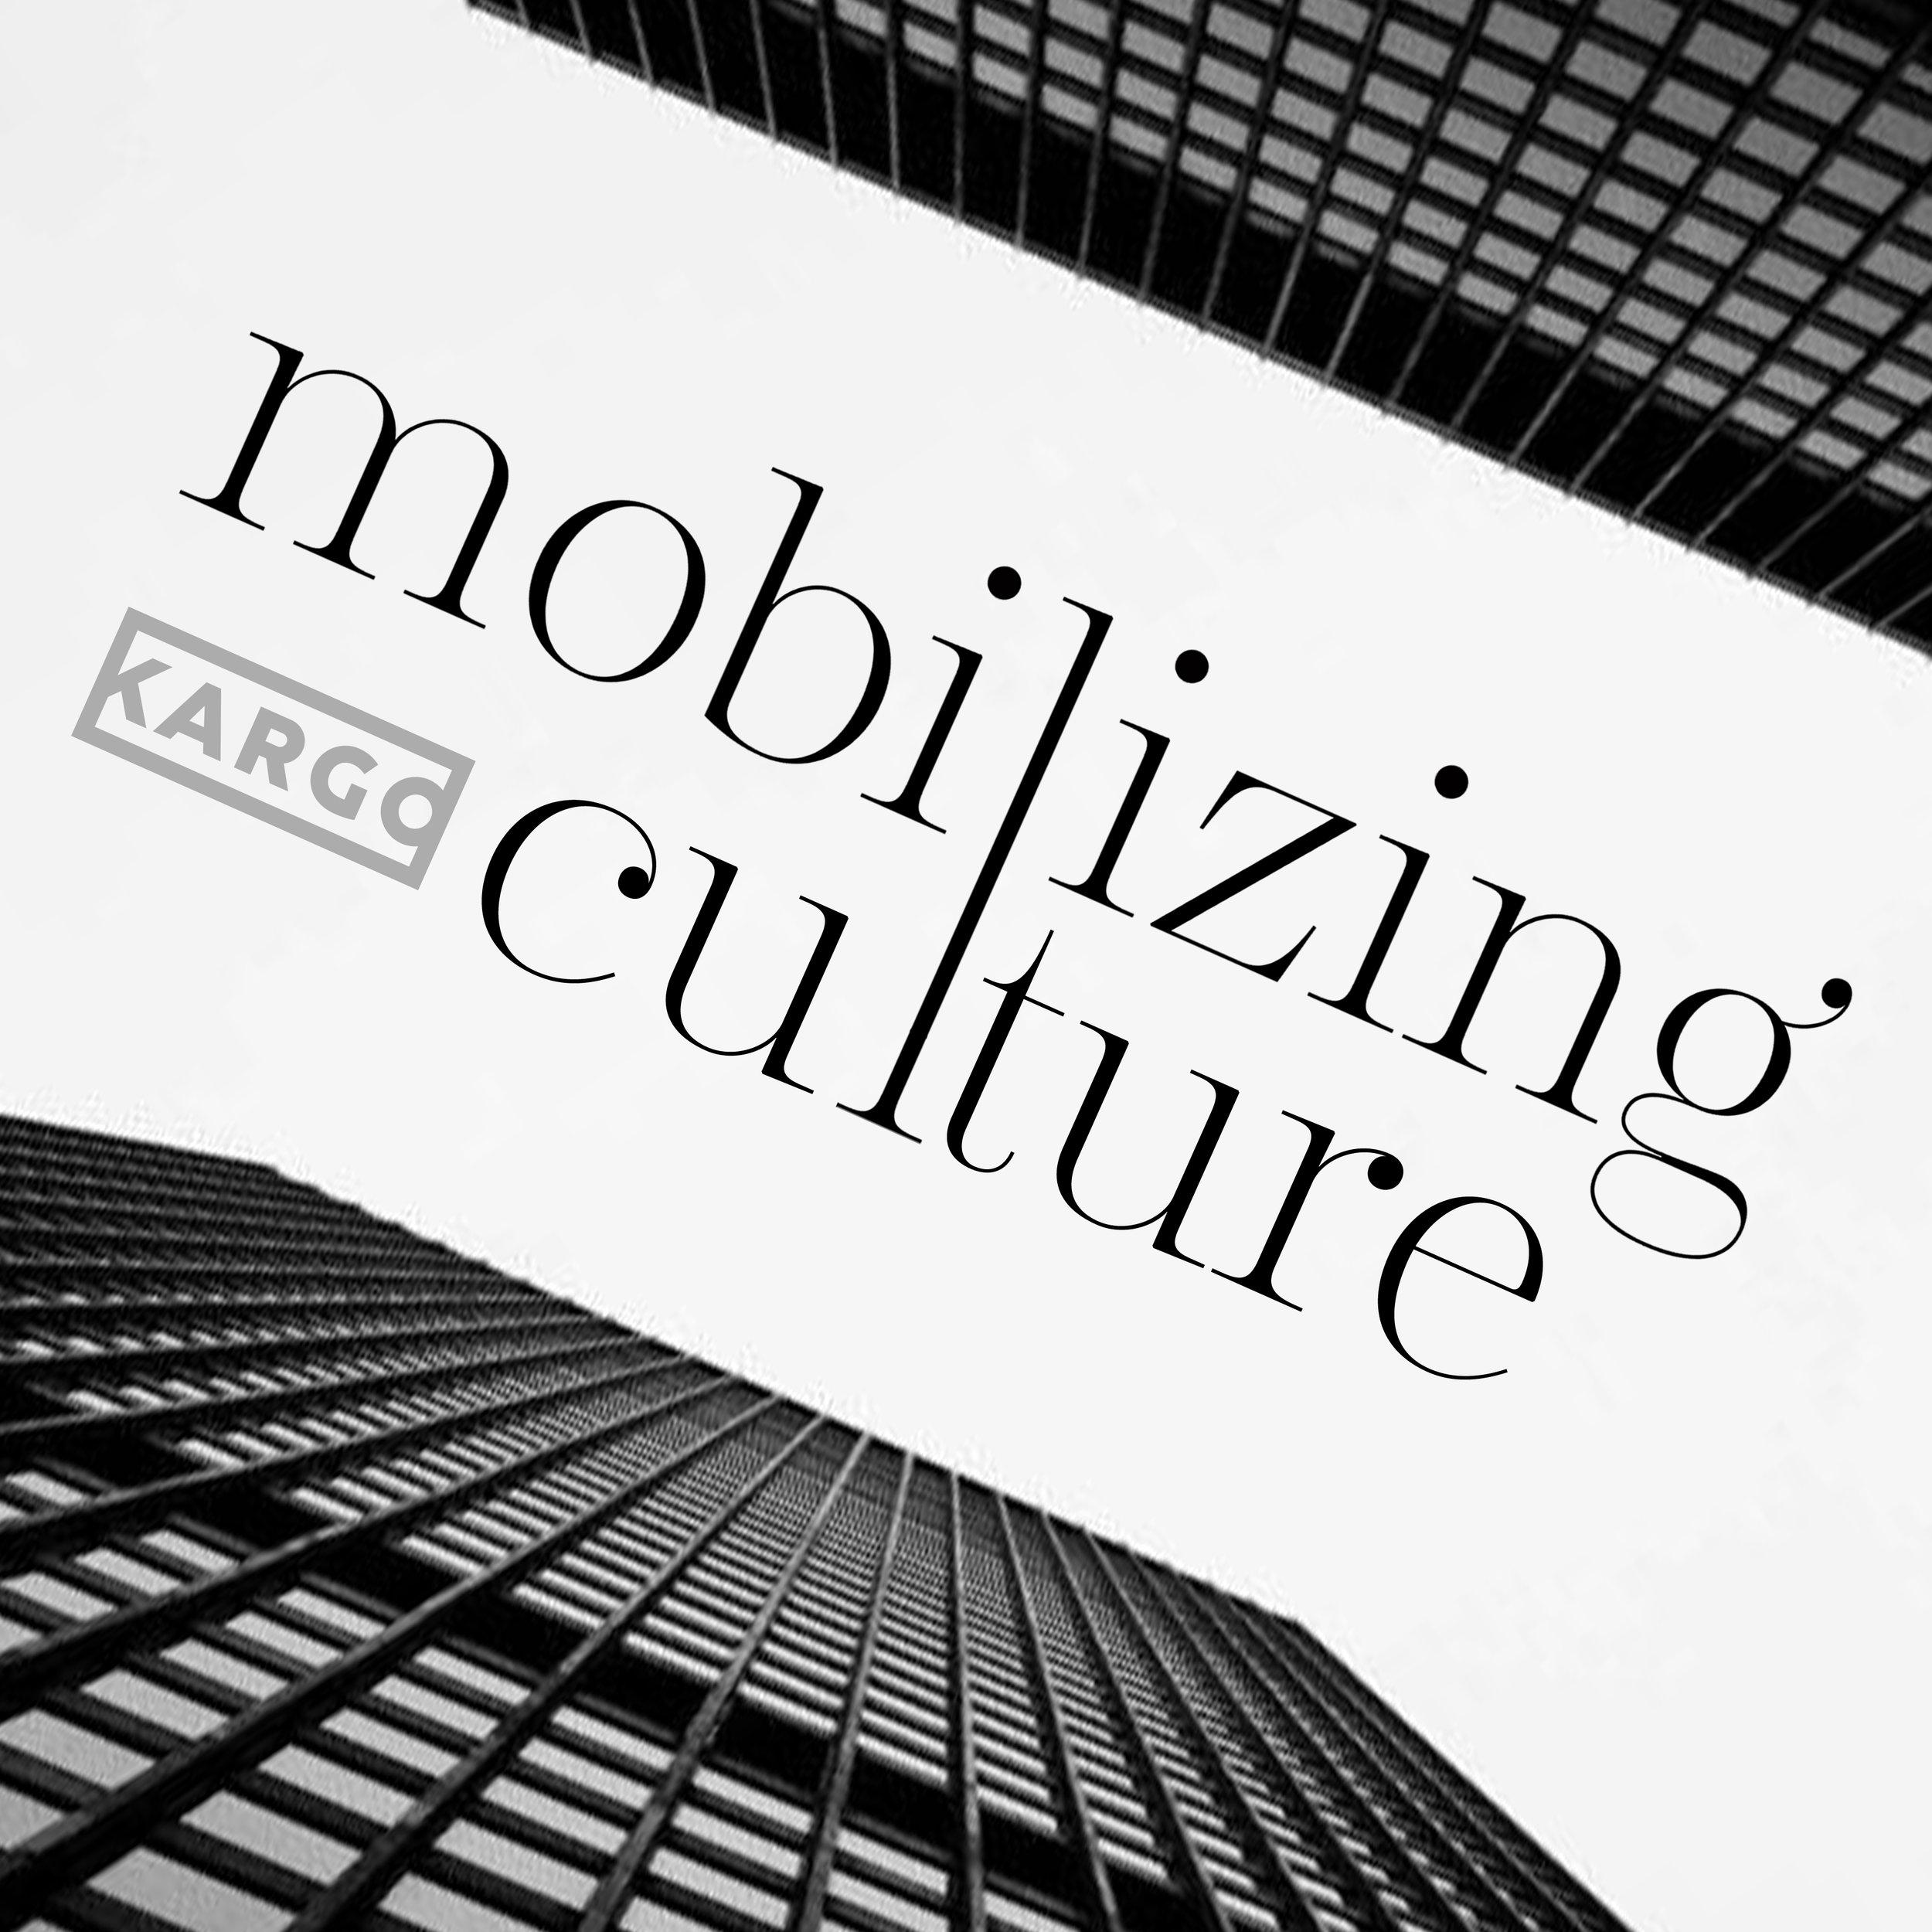 Mobilizingculture_podcast_images_05.03.17_moreop_6_bw.jpg